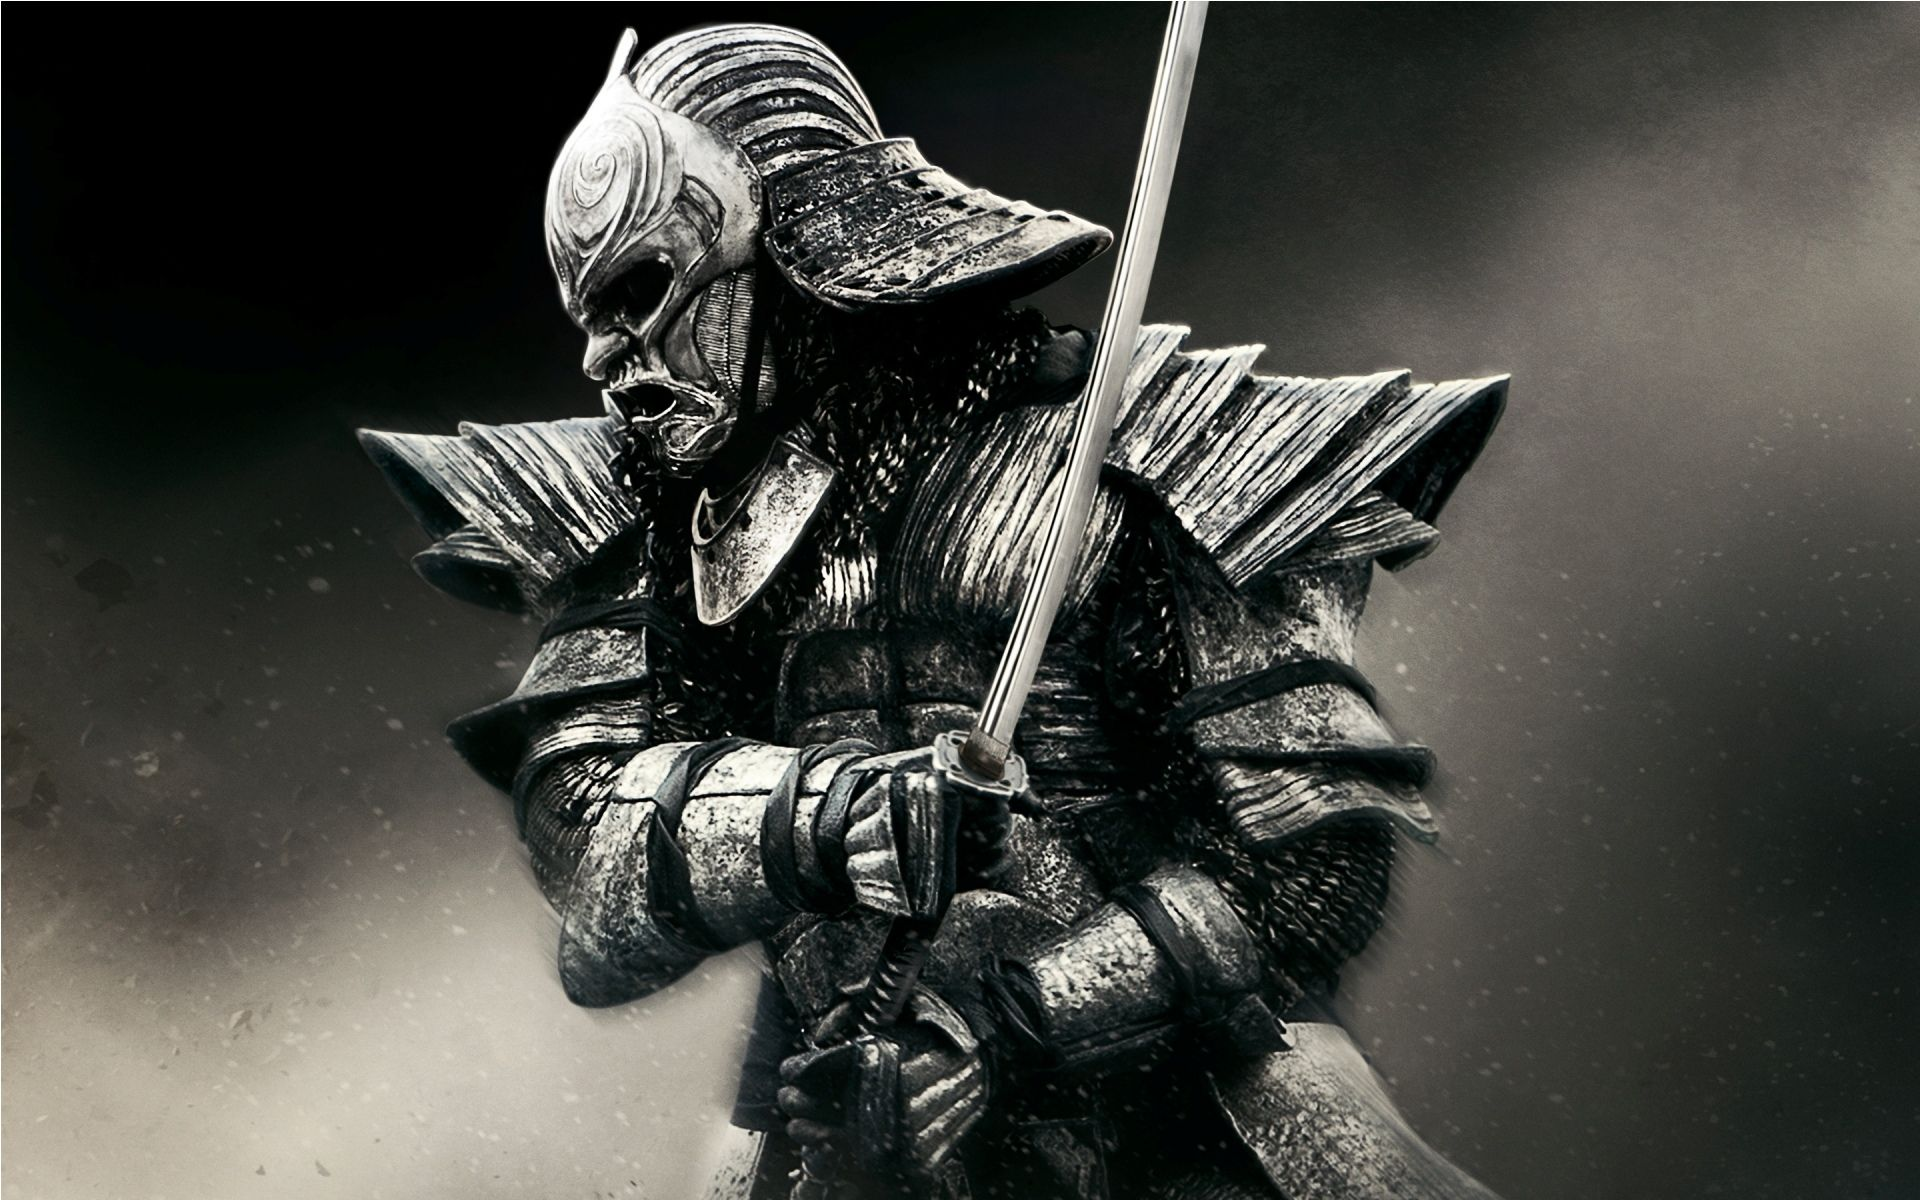 Ronin Samurai WallPaper HD - http://imashon.com/w/ronin ...